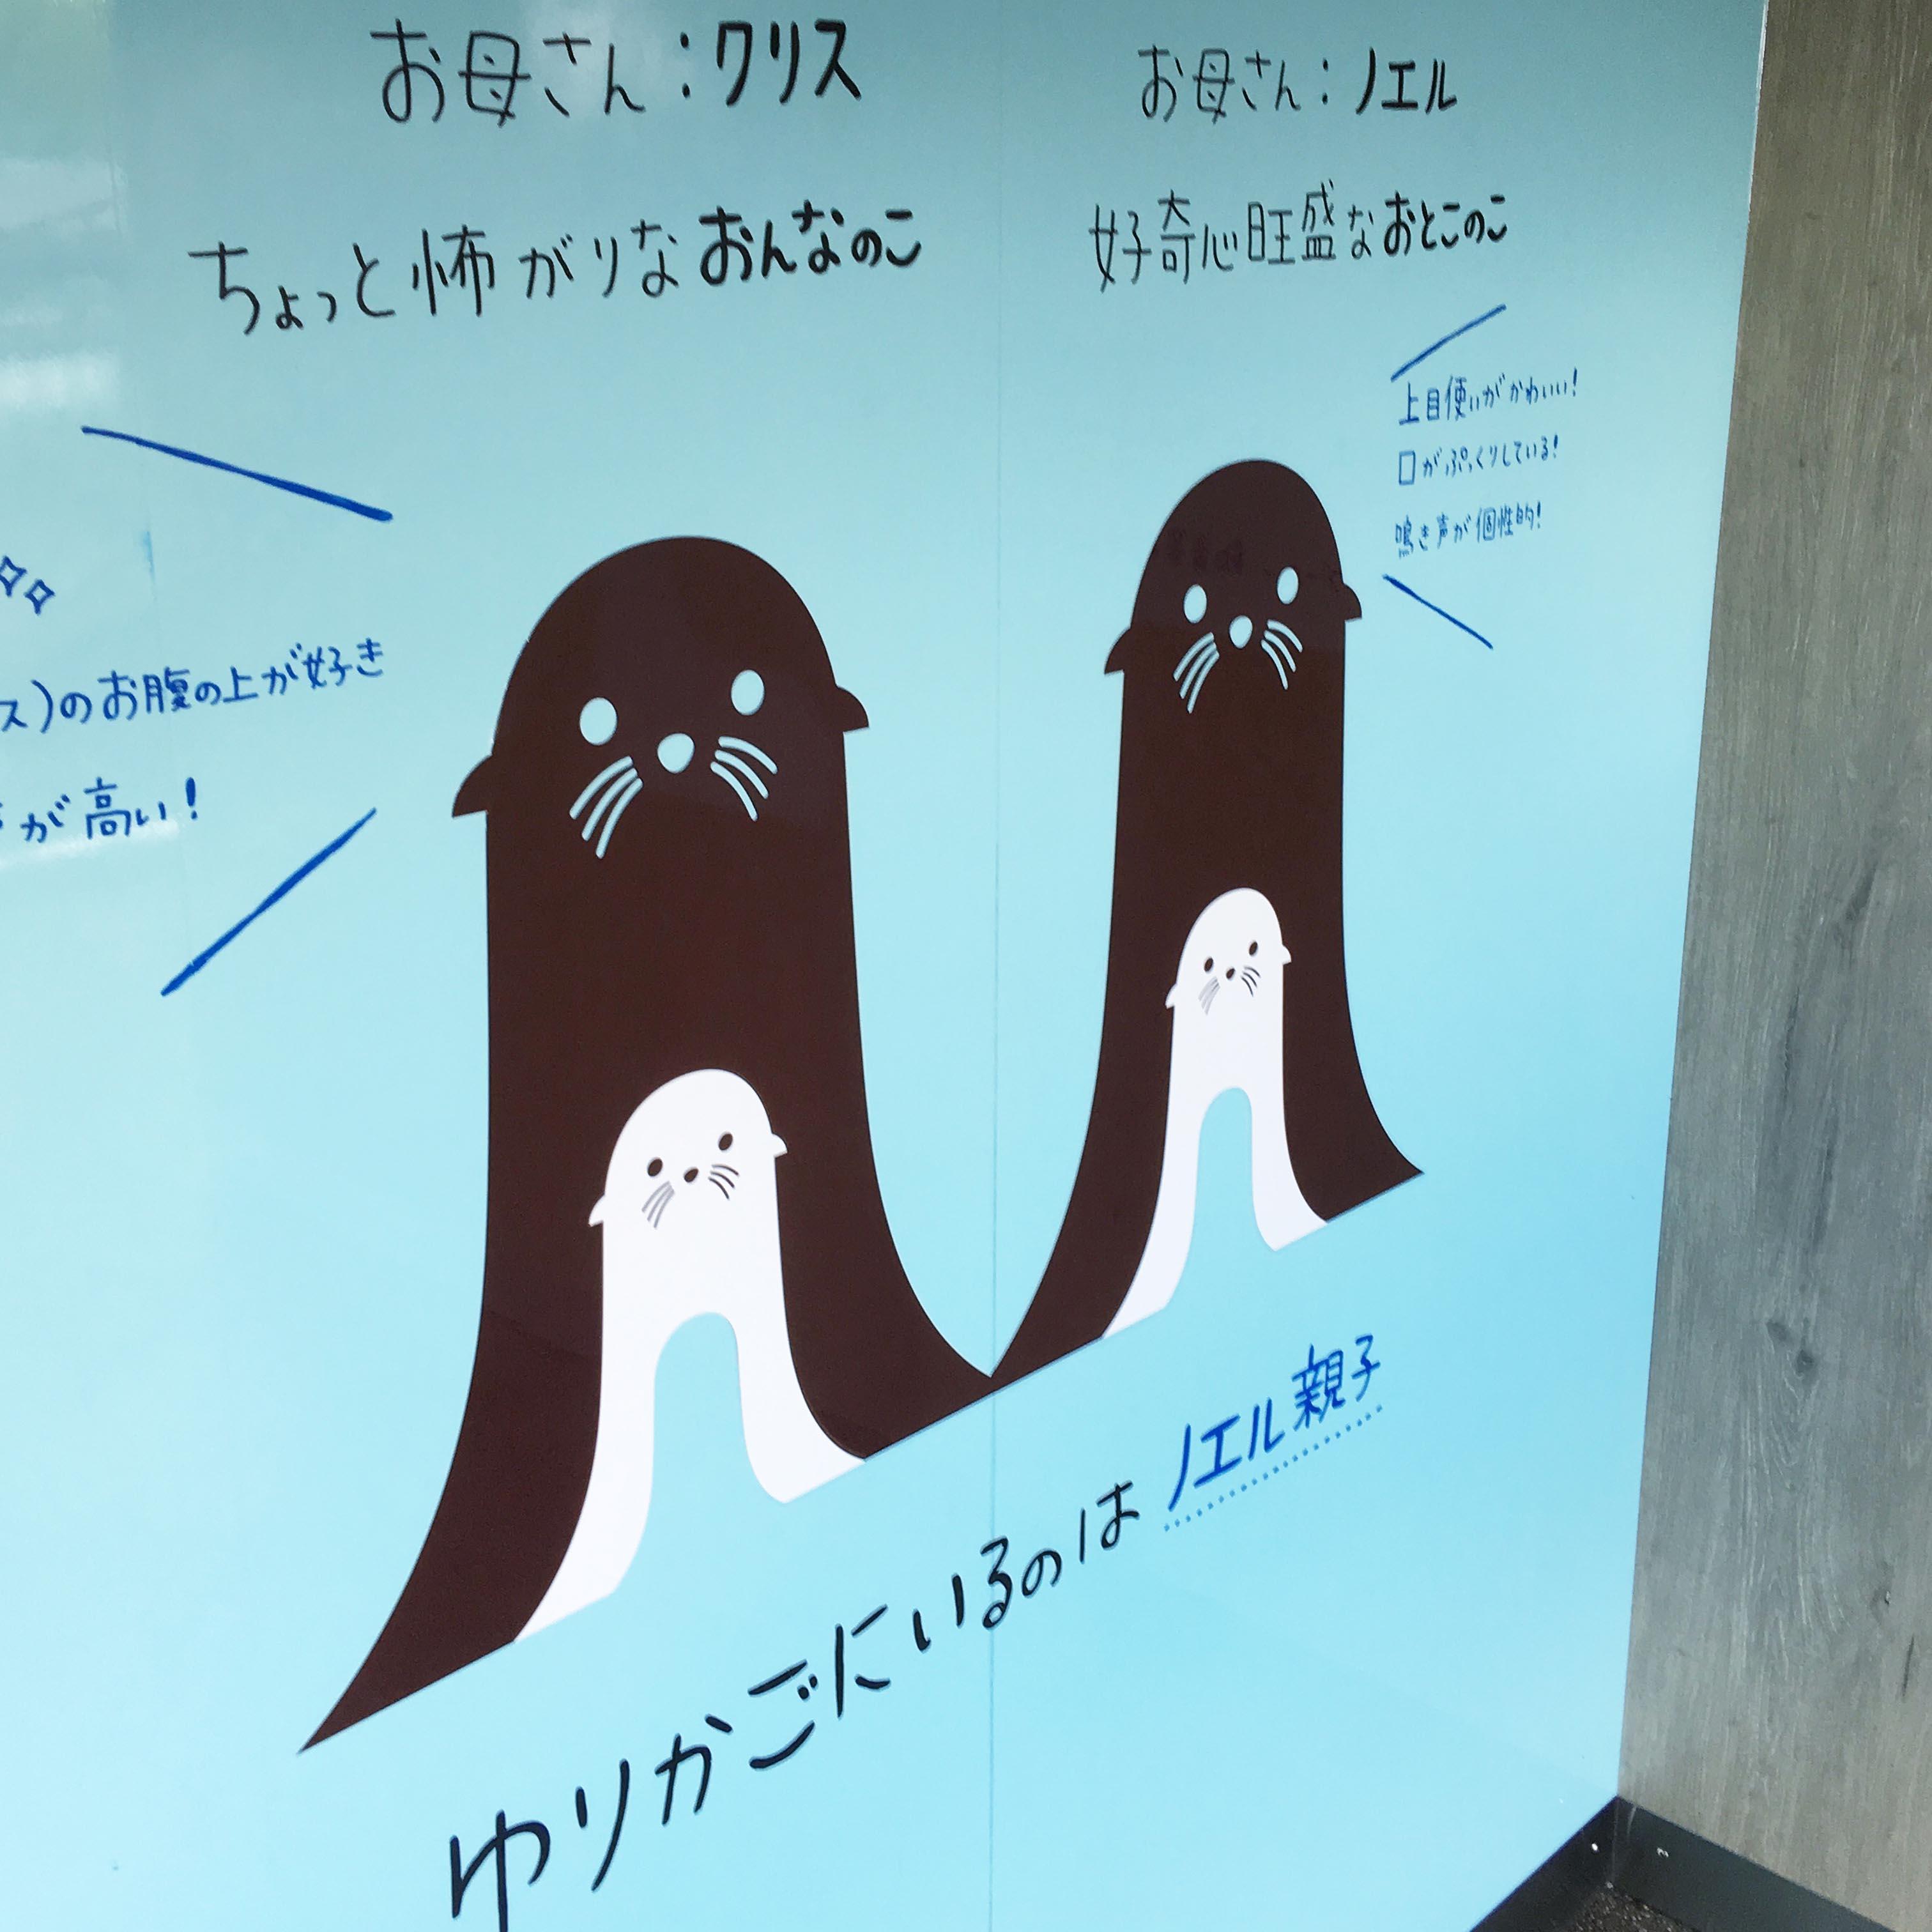 hok_16_ottosei_03